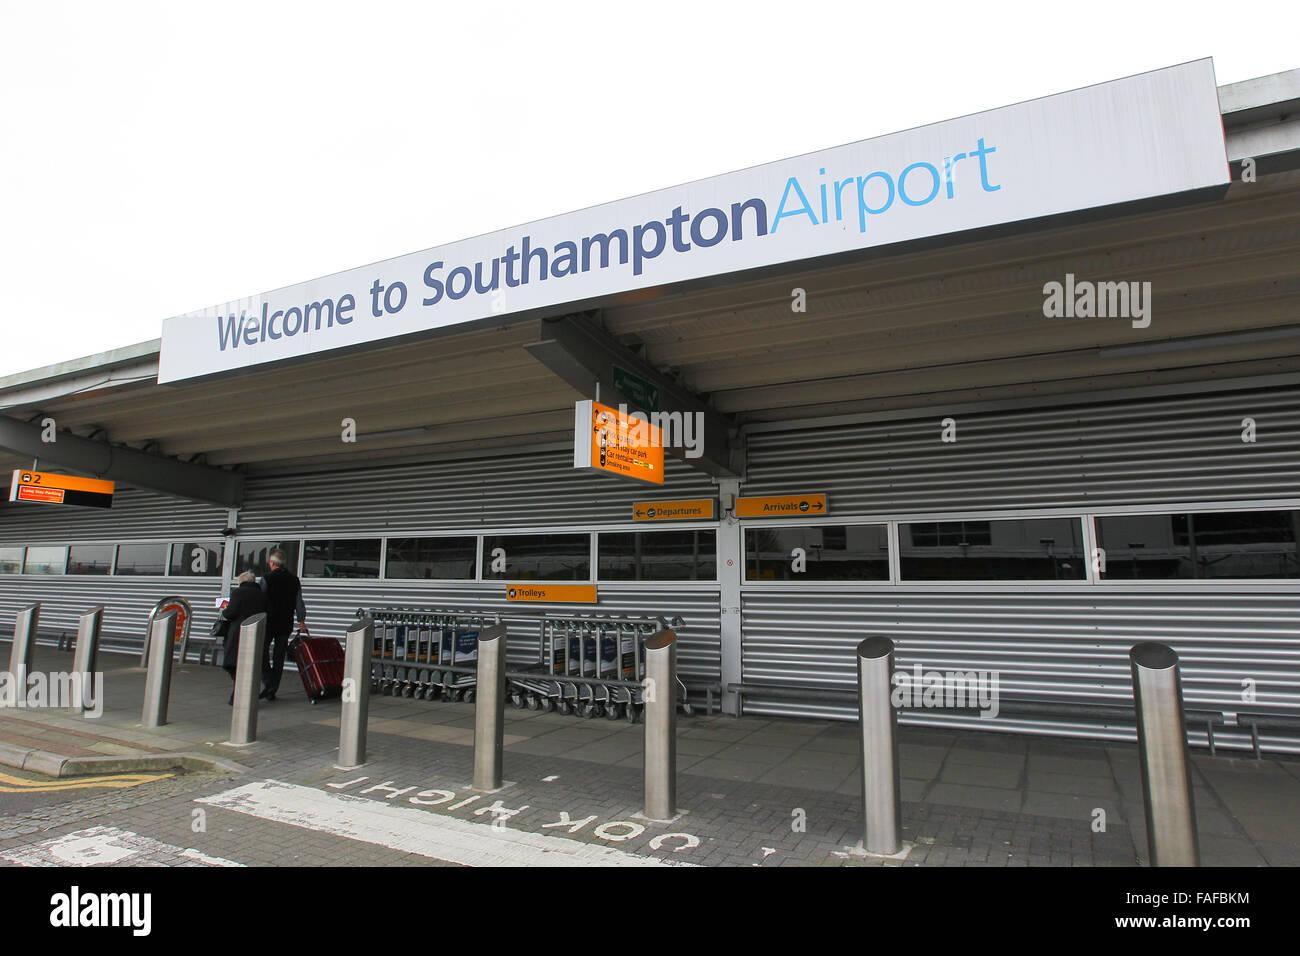 Southampton Airport in Eastleigh, Southampton, Hampshire - Stock Image